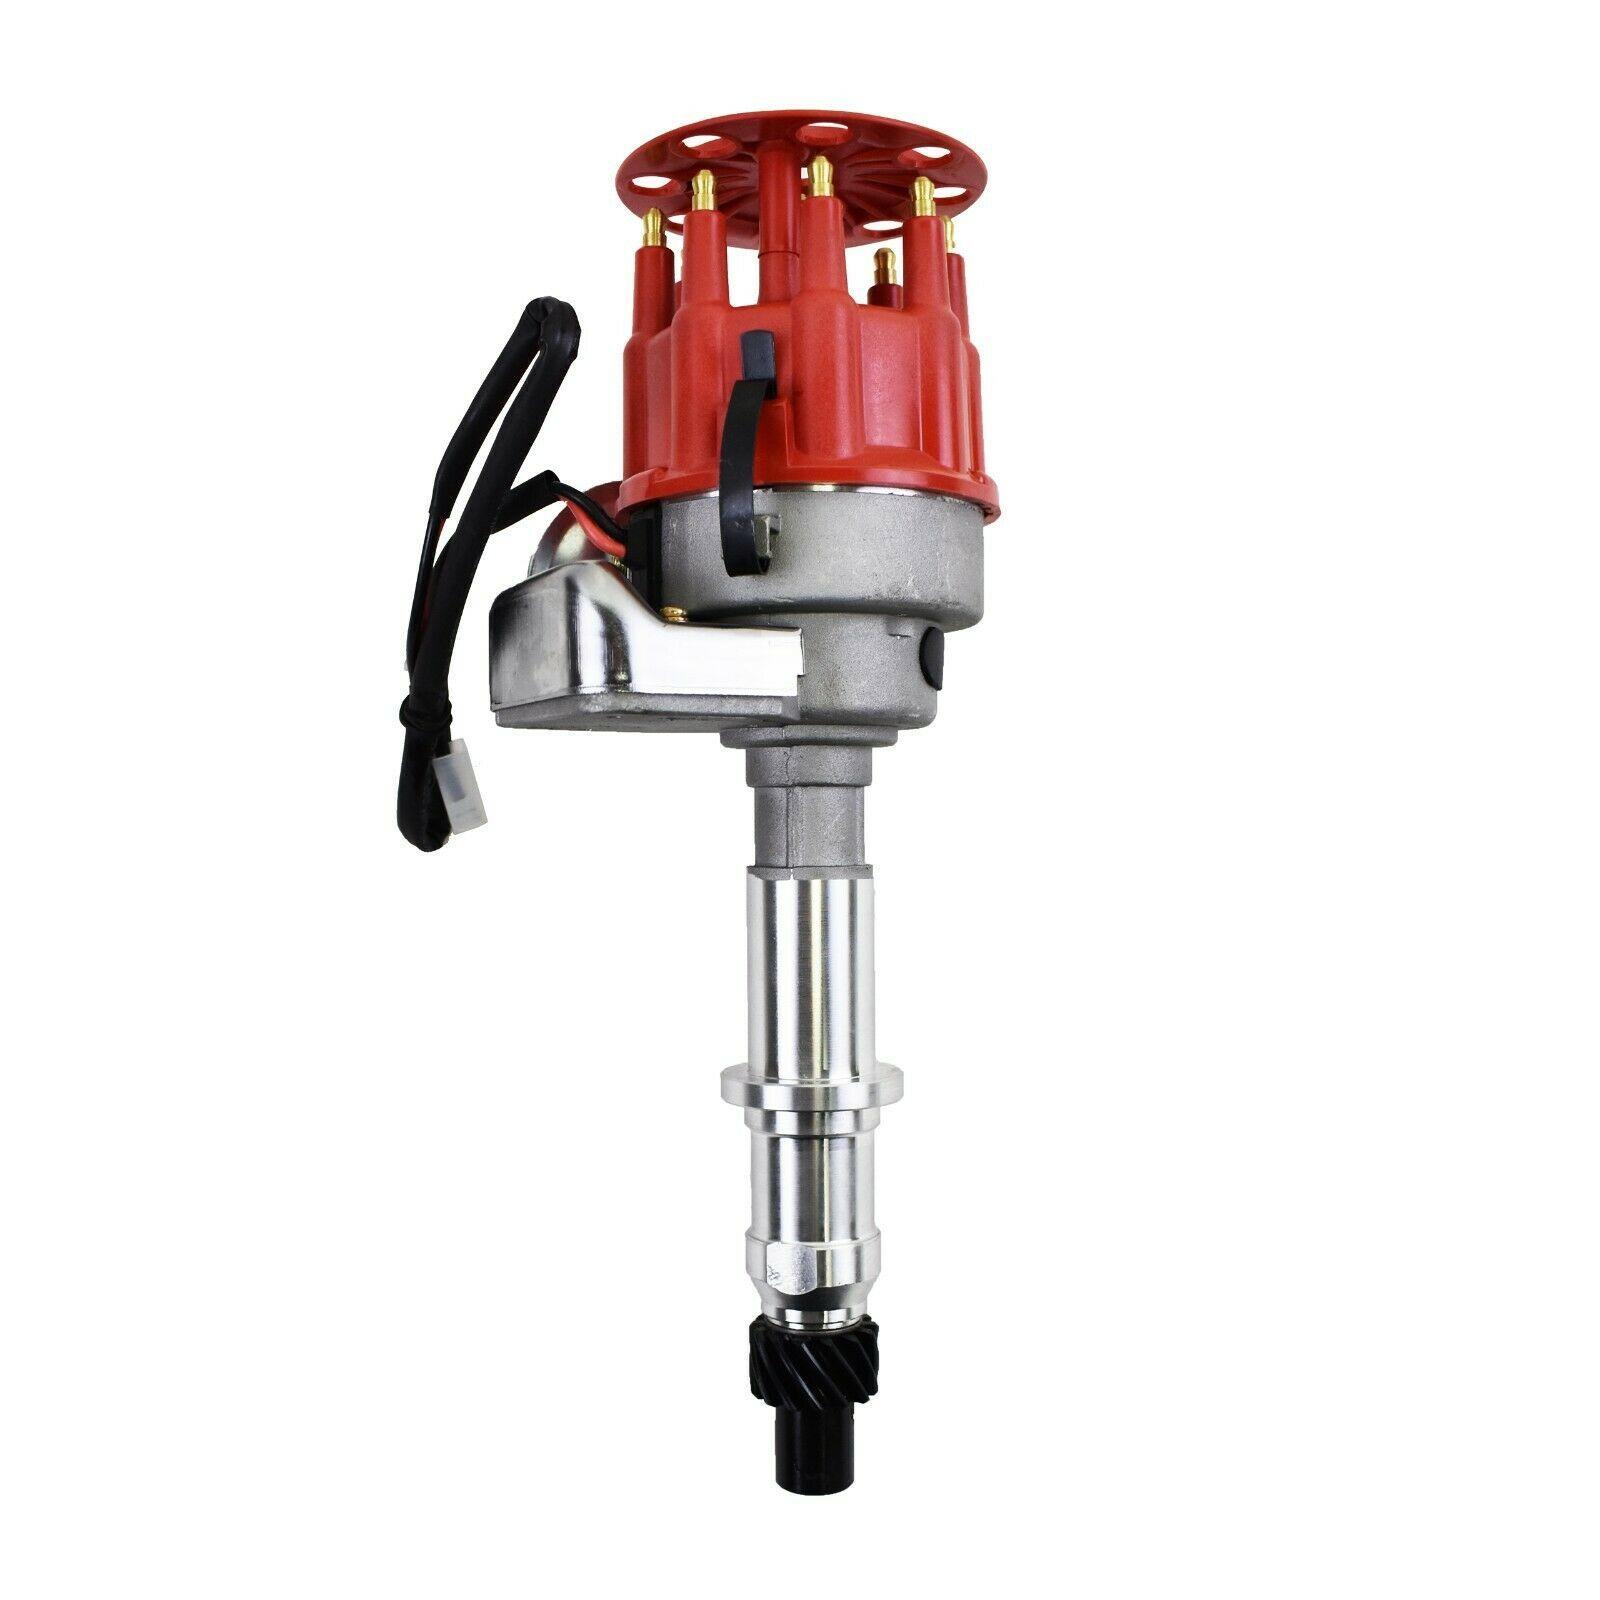 Pontiac Ready 2 Run R2R Distributor V8 301 326 350 387 400 421428 455, Red Cap